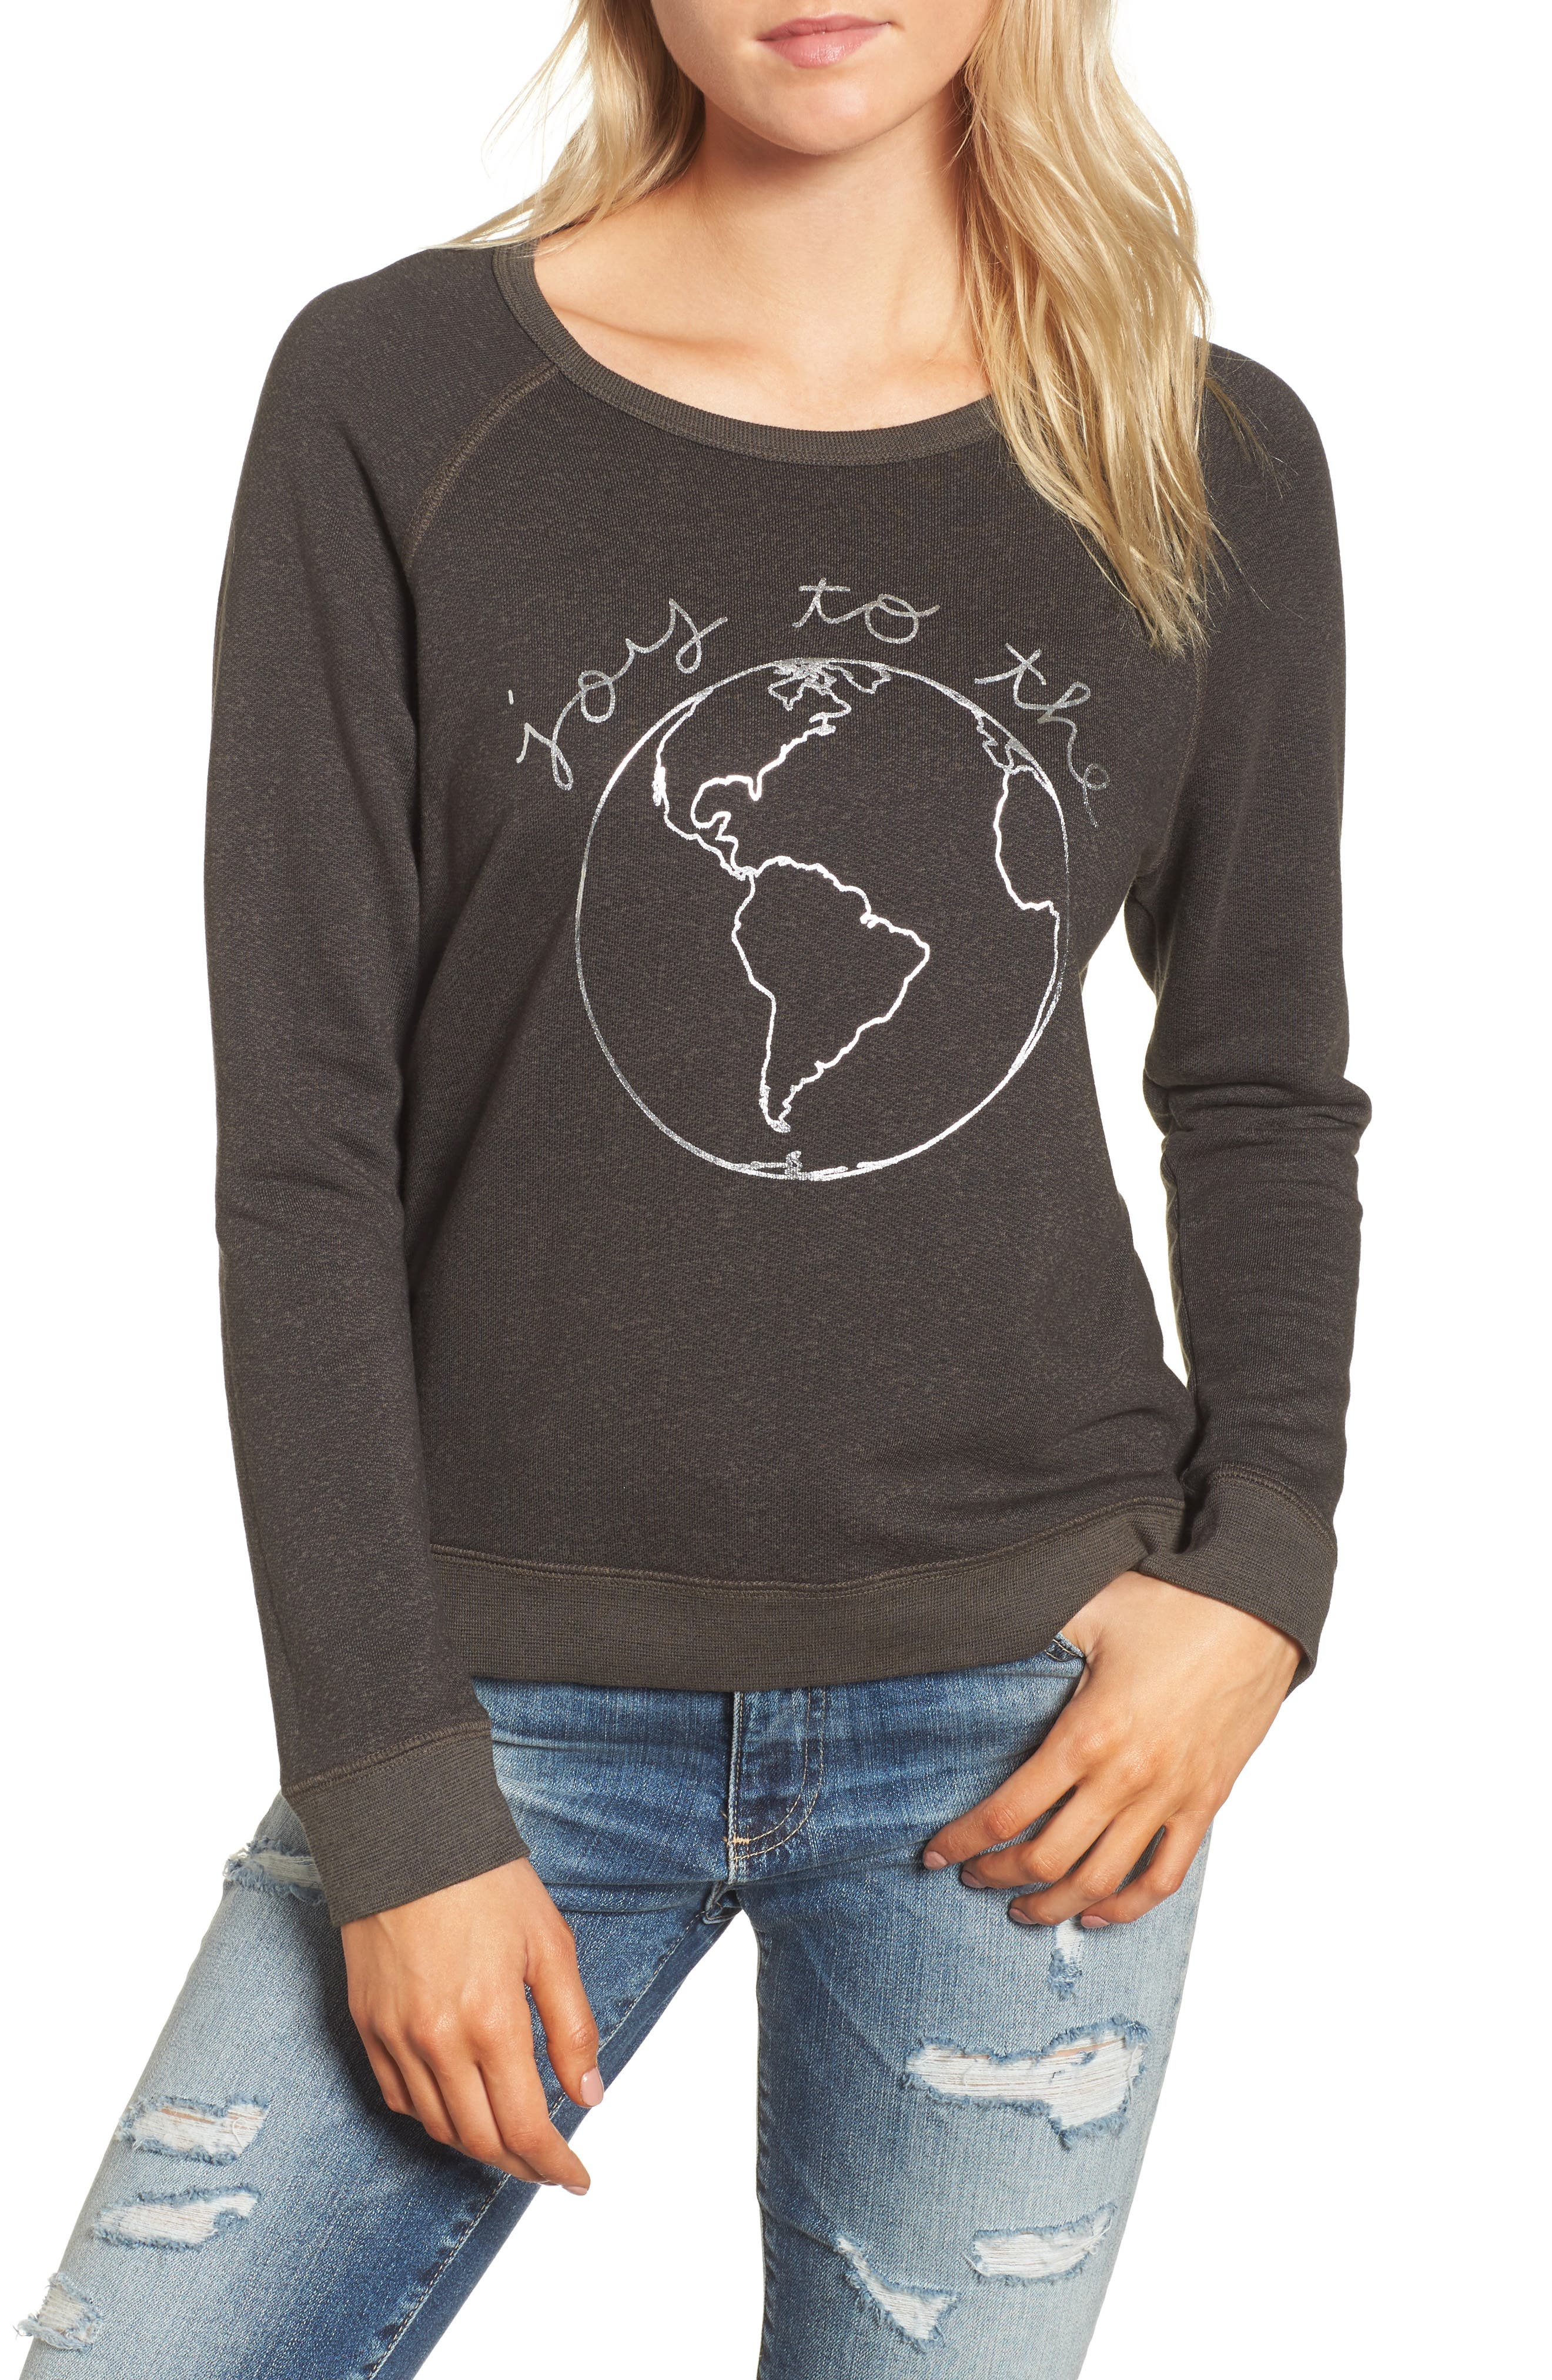 Joy to the World Sweatshirt,                         Main,                         color, 001